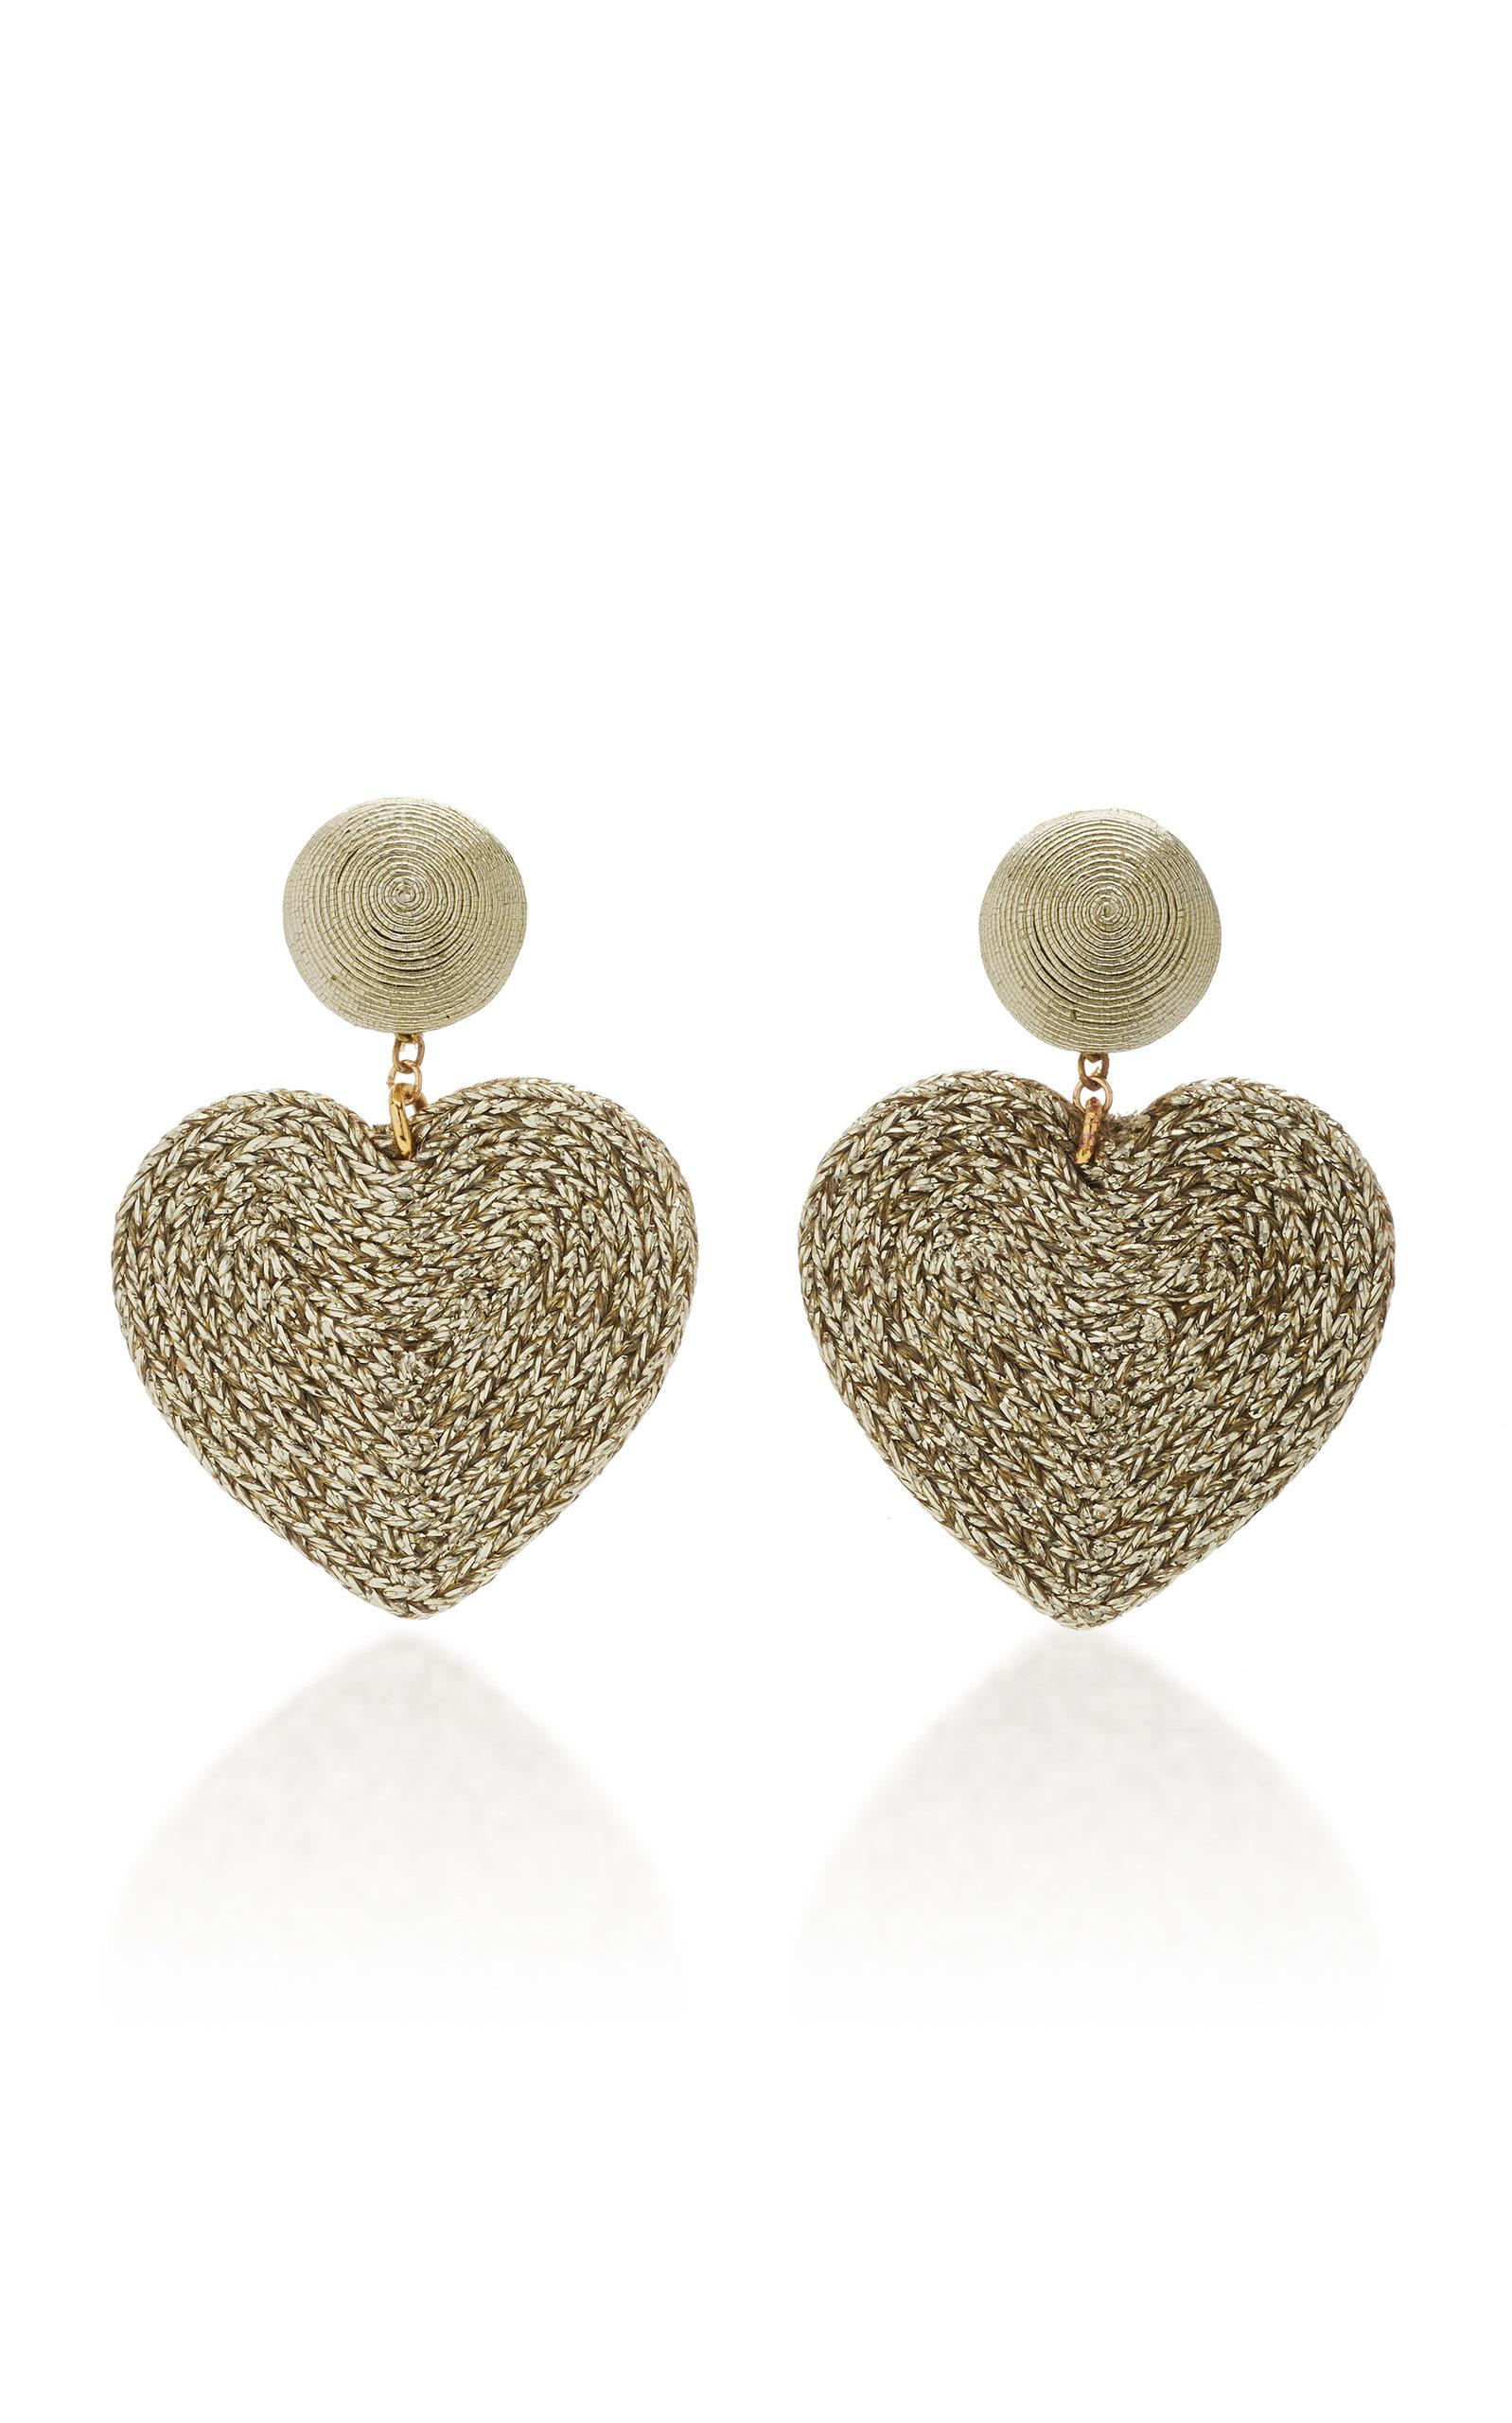 Rebecca De Ravenel Cora Cord And Gold-plated Clip Earrings